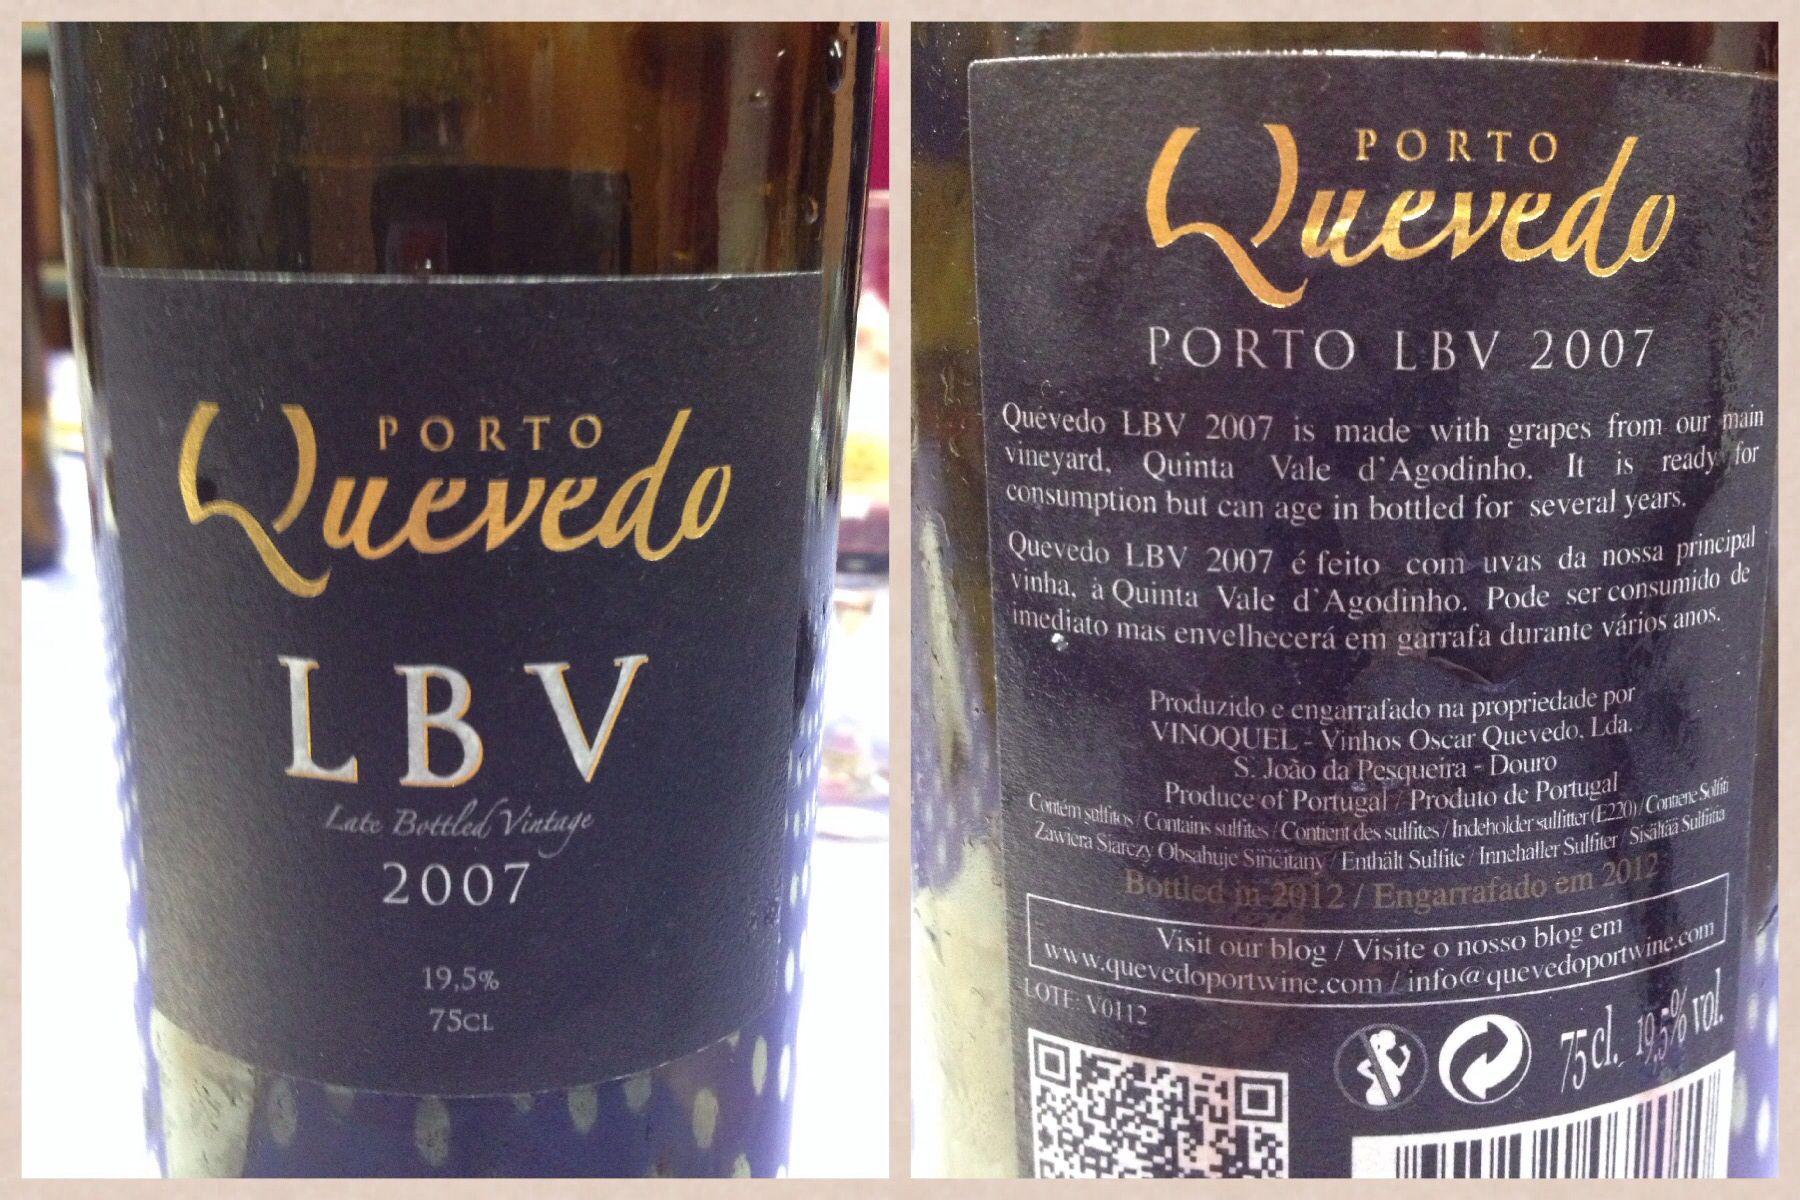 Quevedo LBV 2007, embotellado 2012. Vino de Oporto.